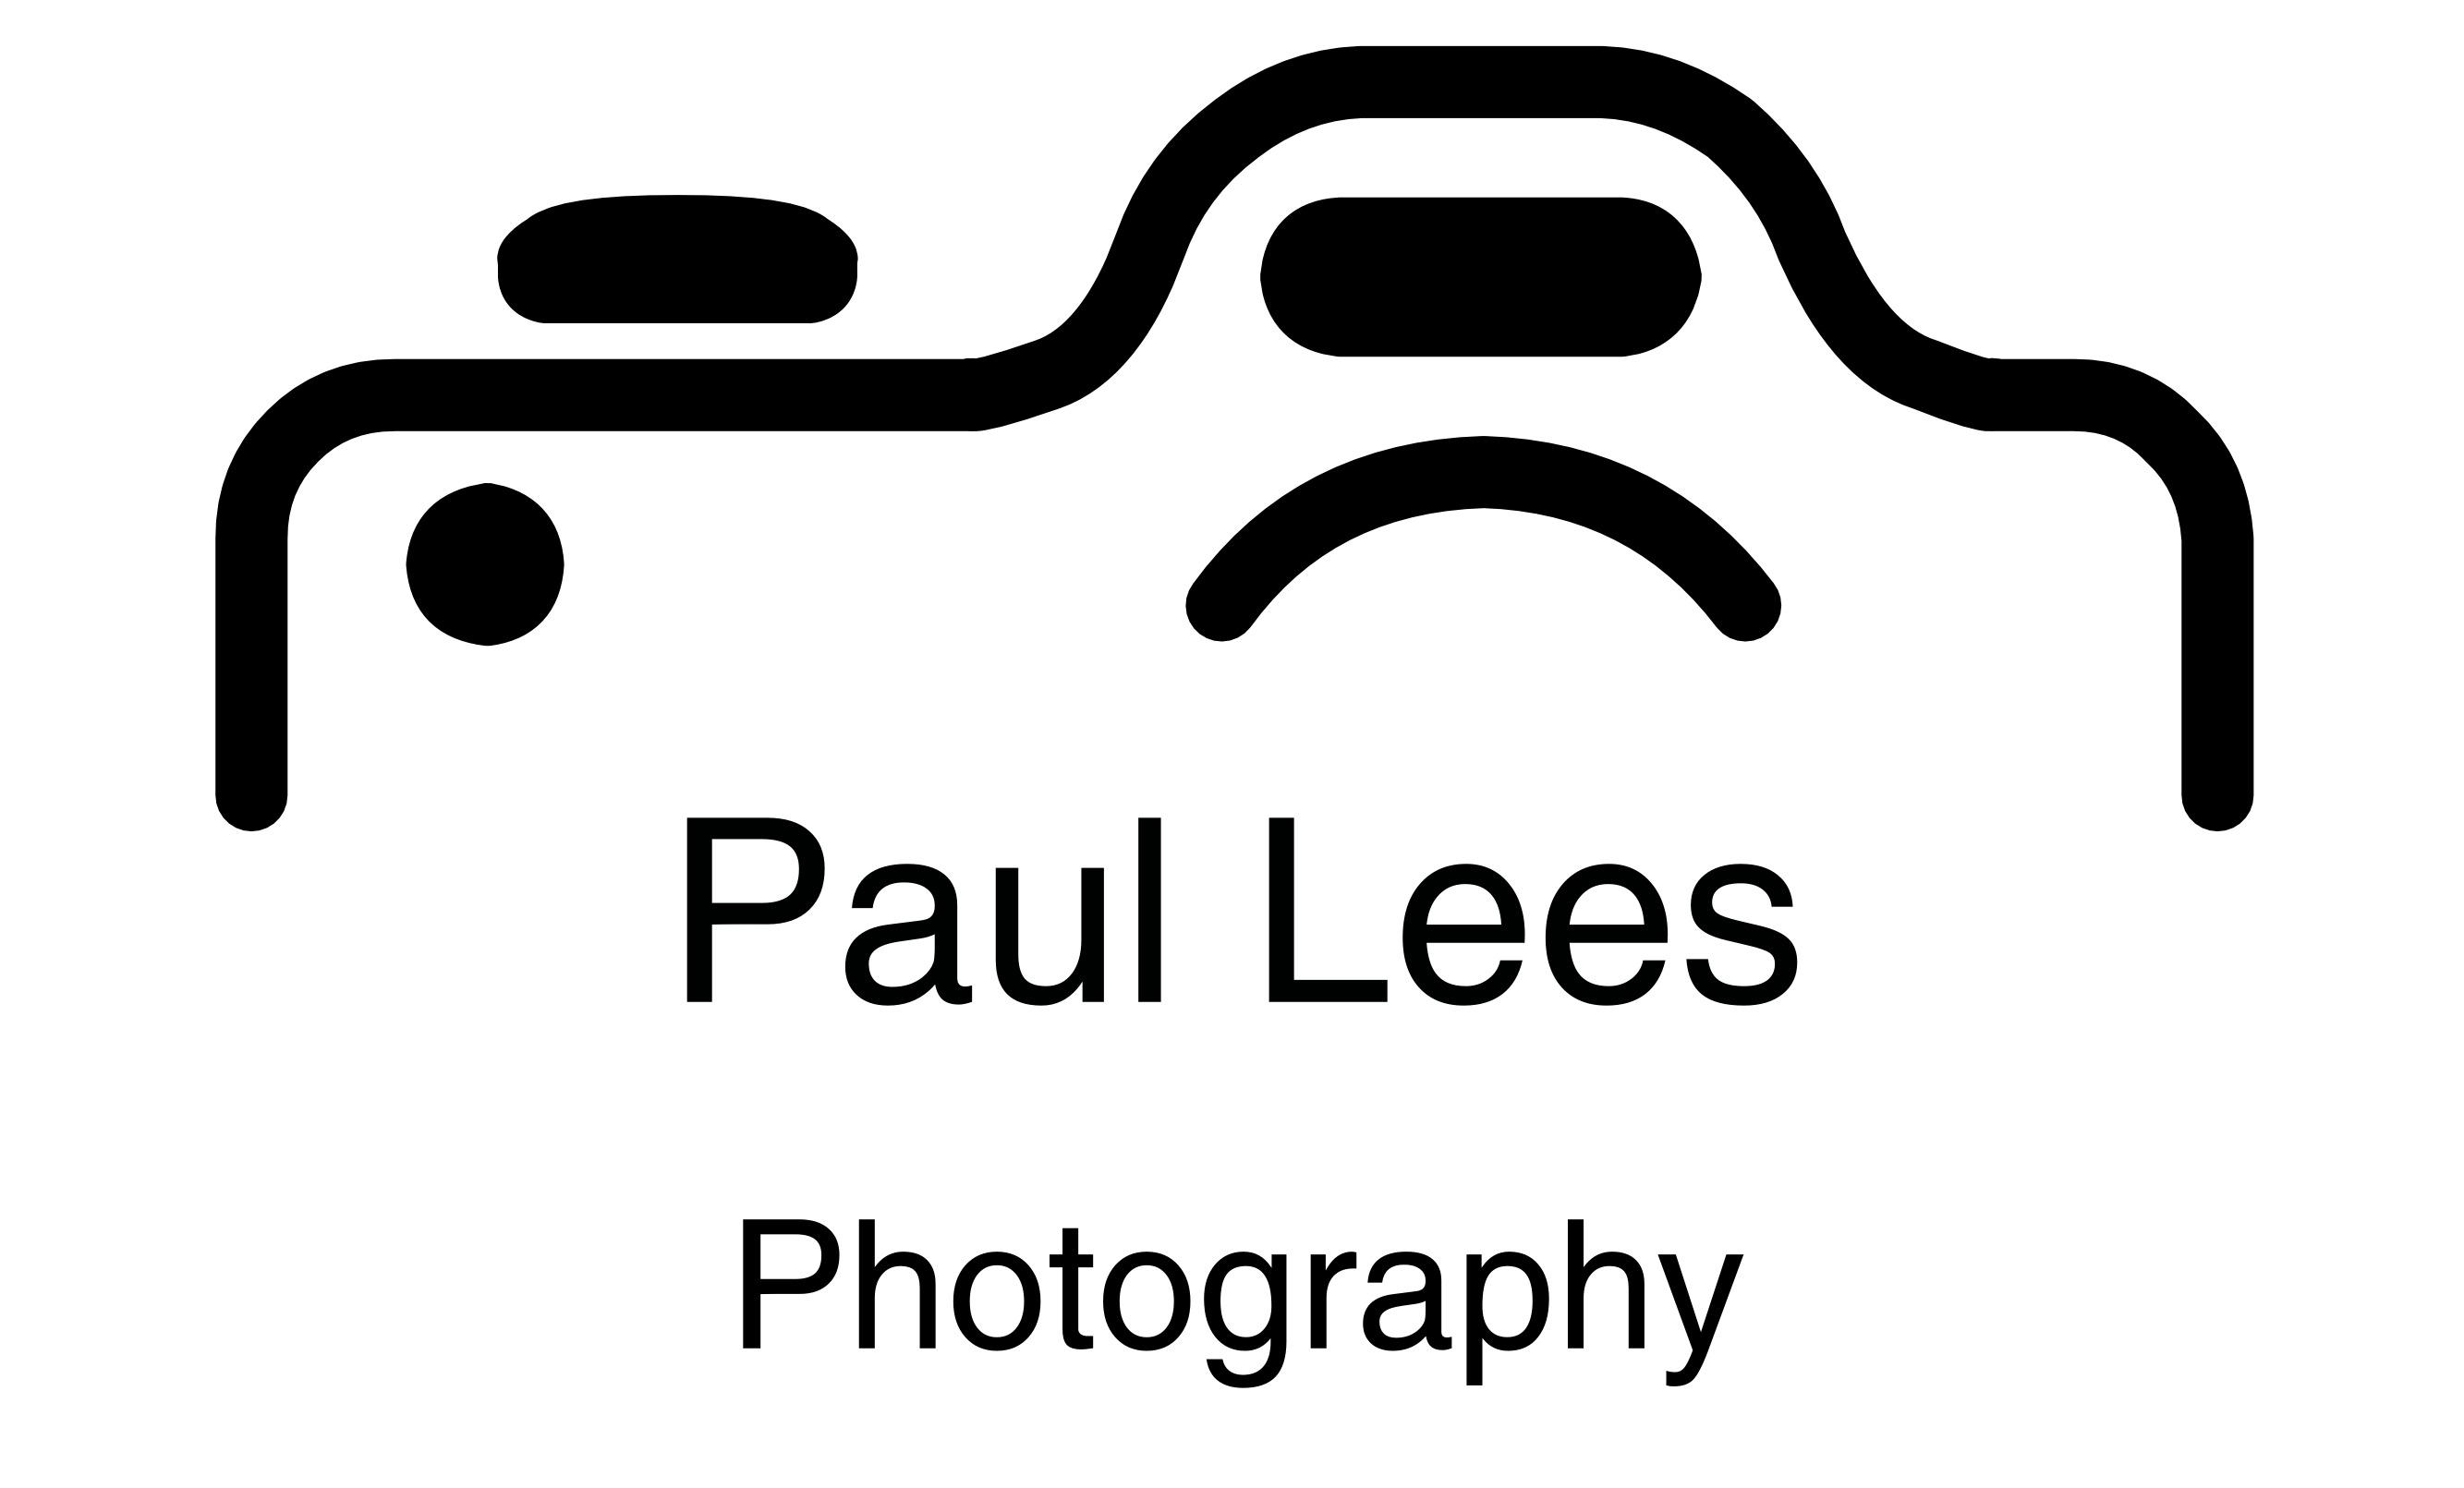 Paul Lees Photography